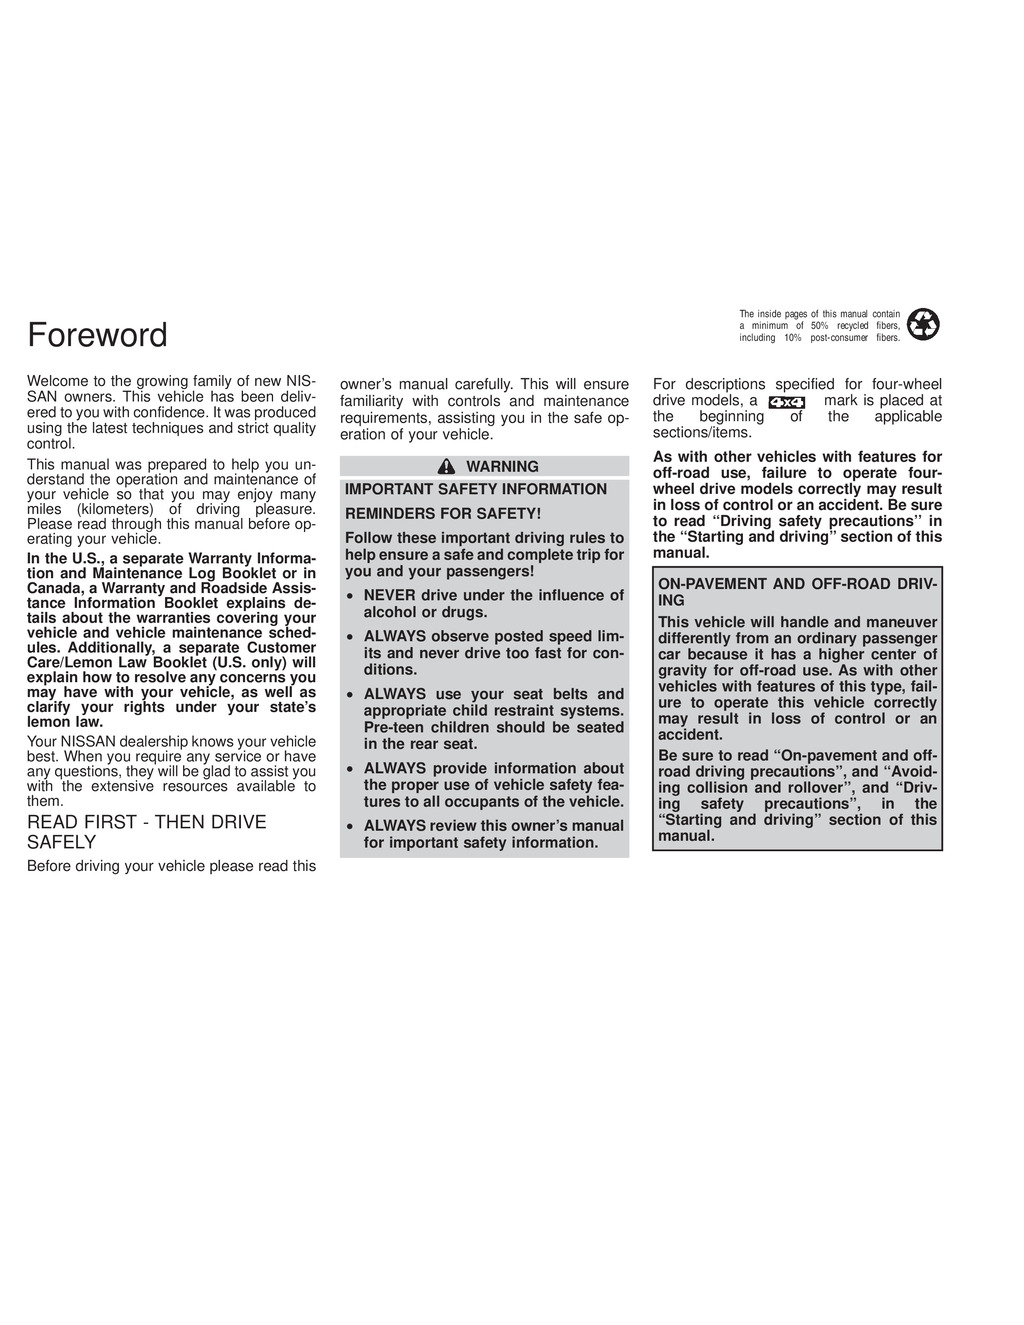 2000 Nissan Xterra owners manual